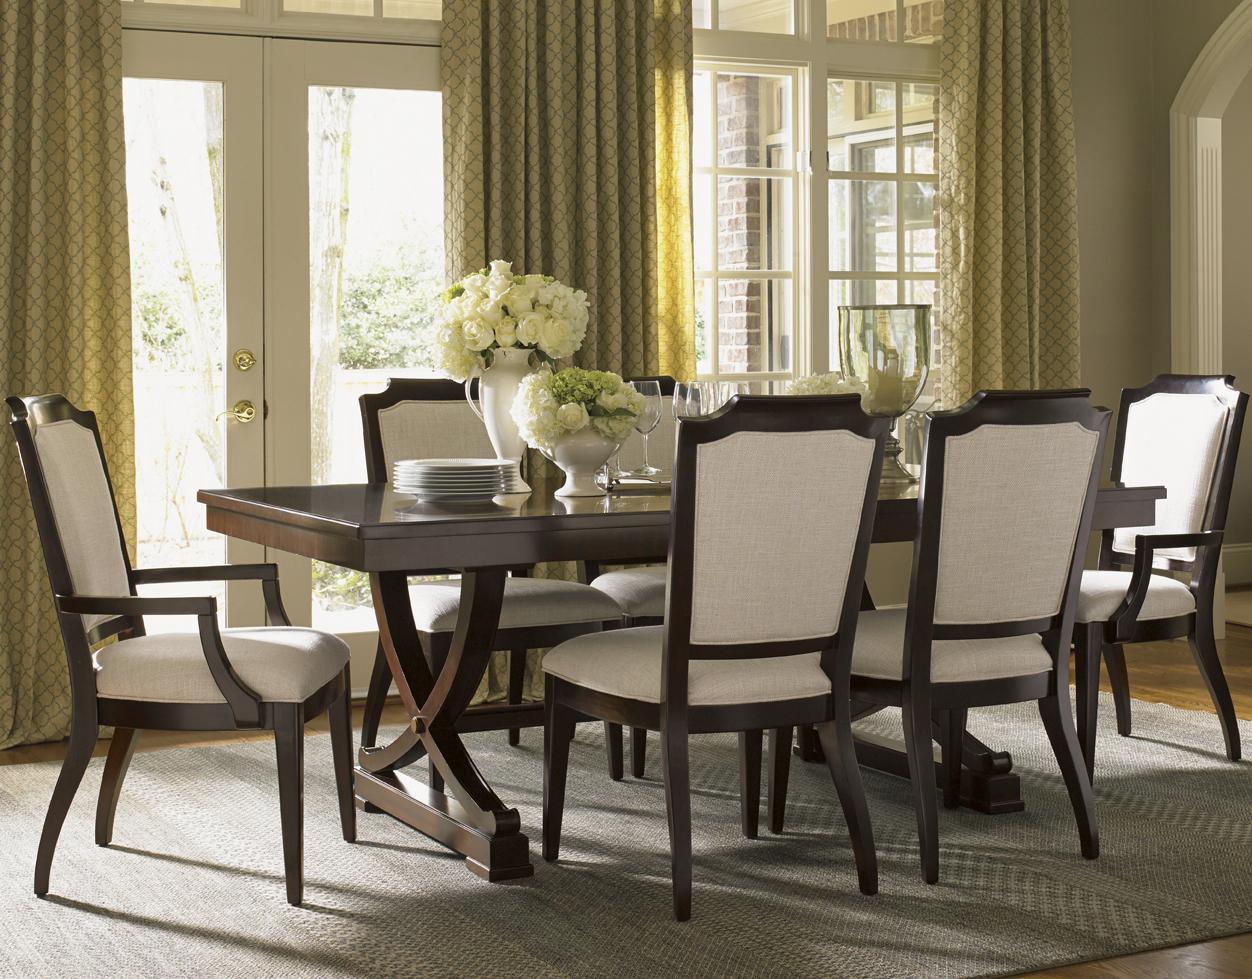 Kensington Place 7 Pc Dining Set by Lexington at Baer's Furniture